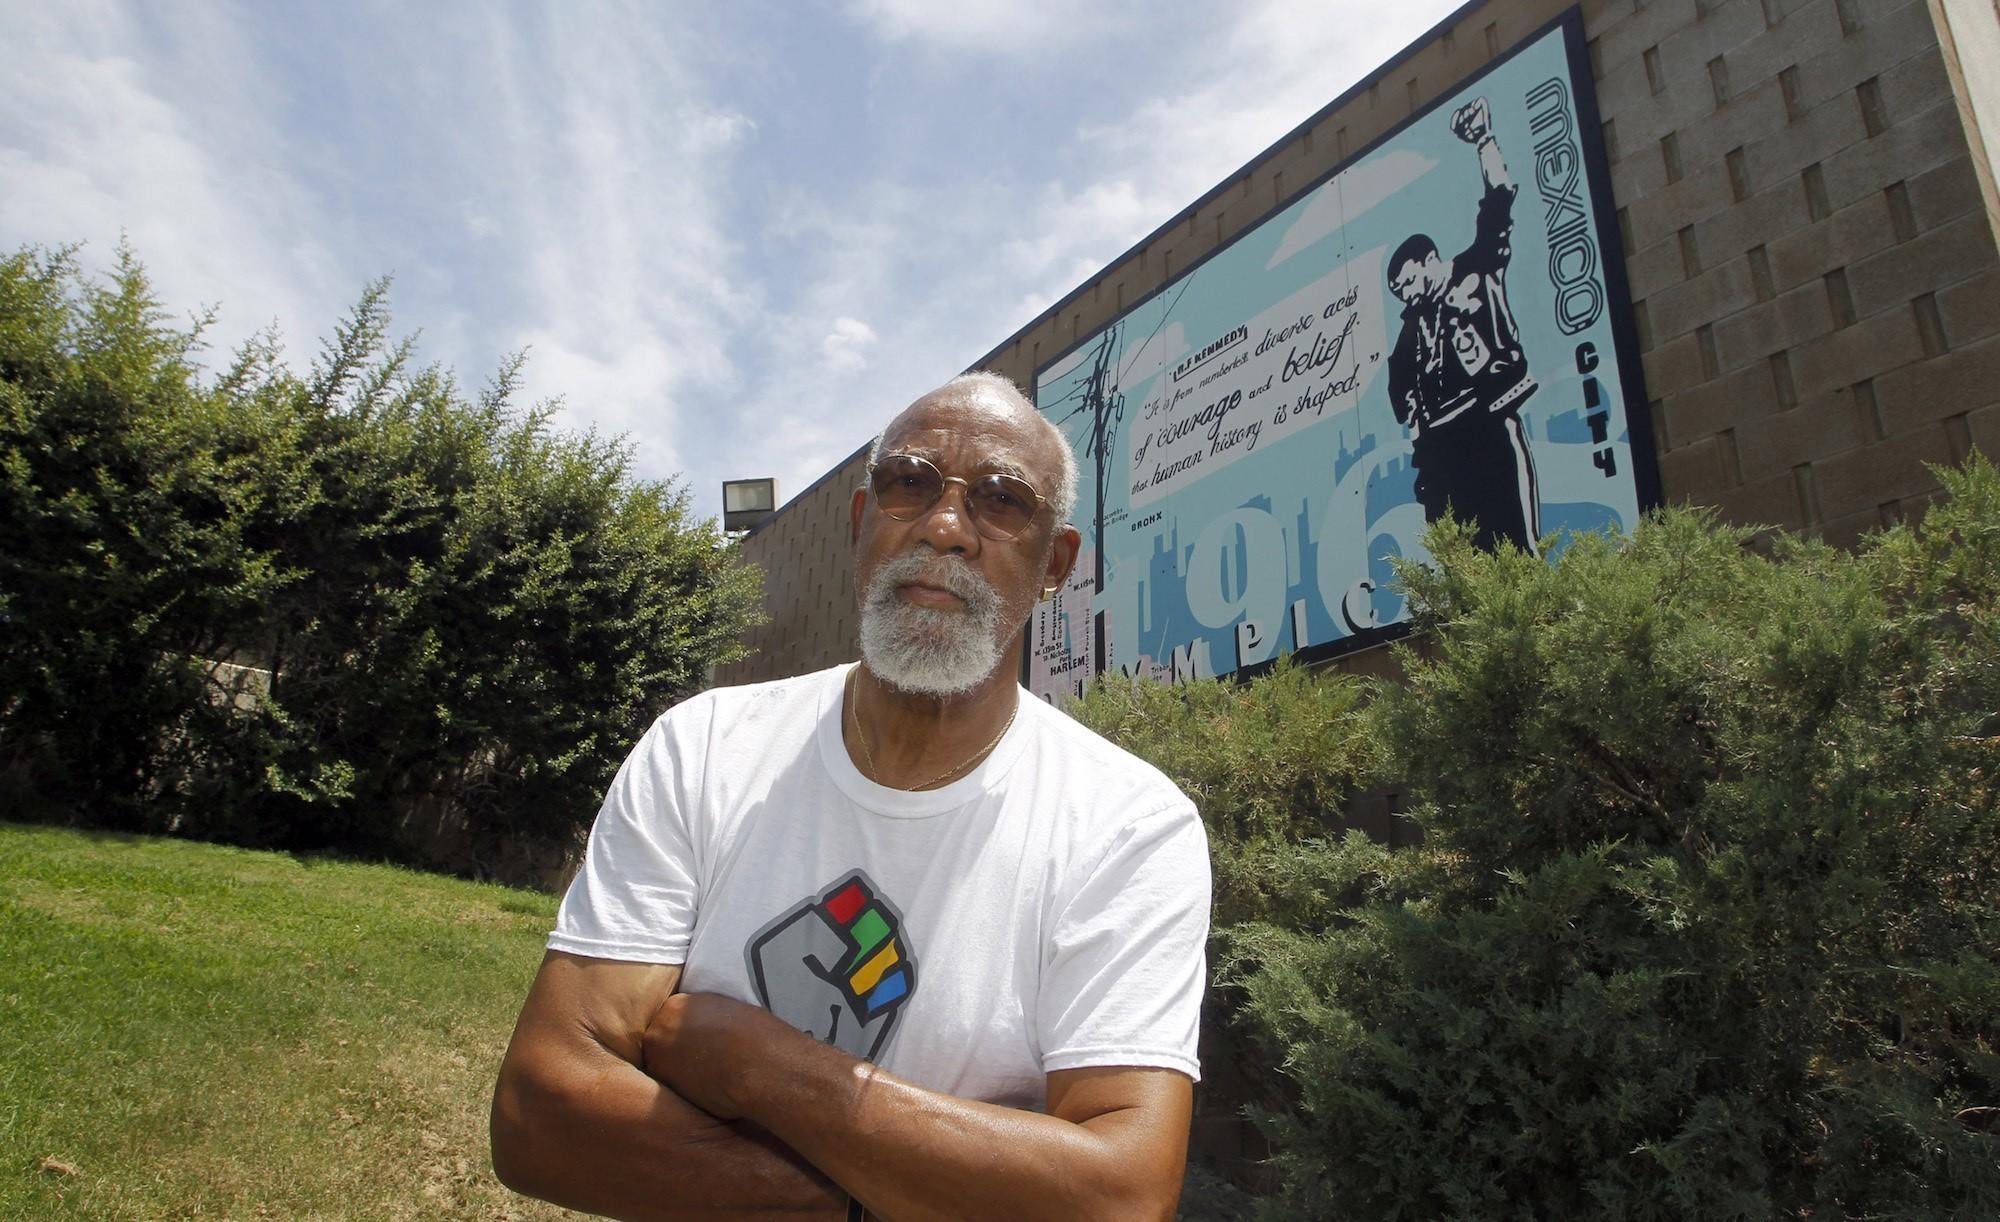 Iconic Olympics protester John Carlos admires Colin Kaepernick's 'courage'